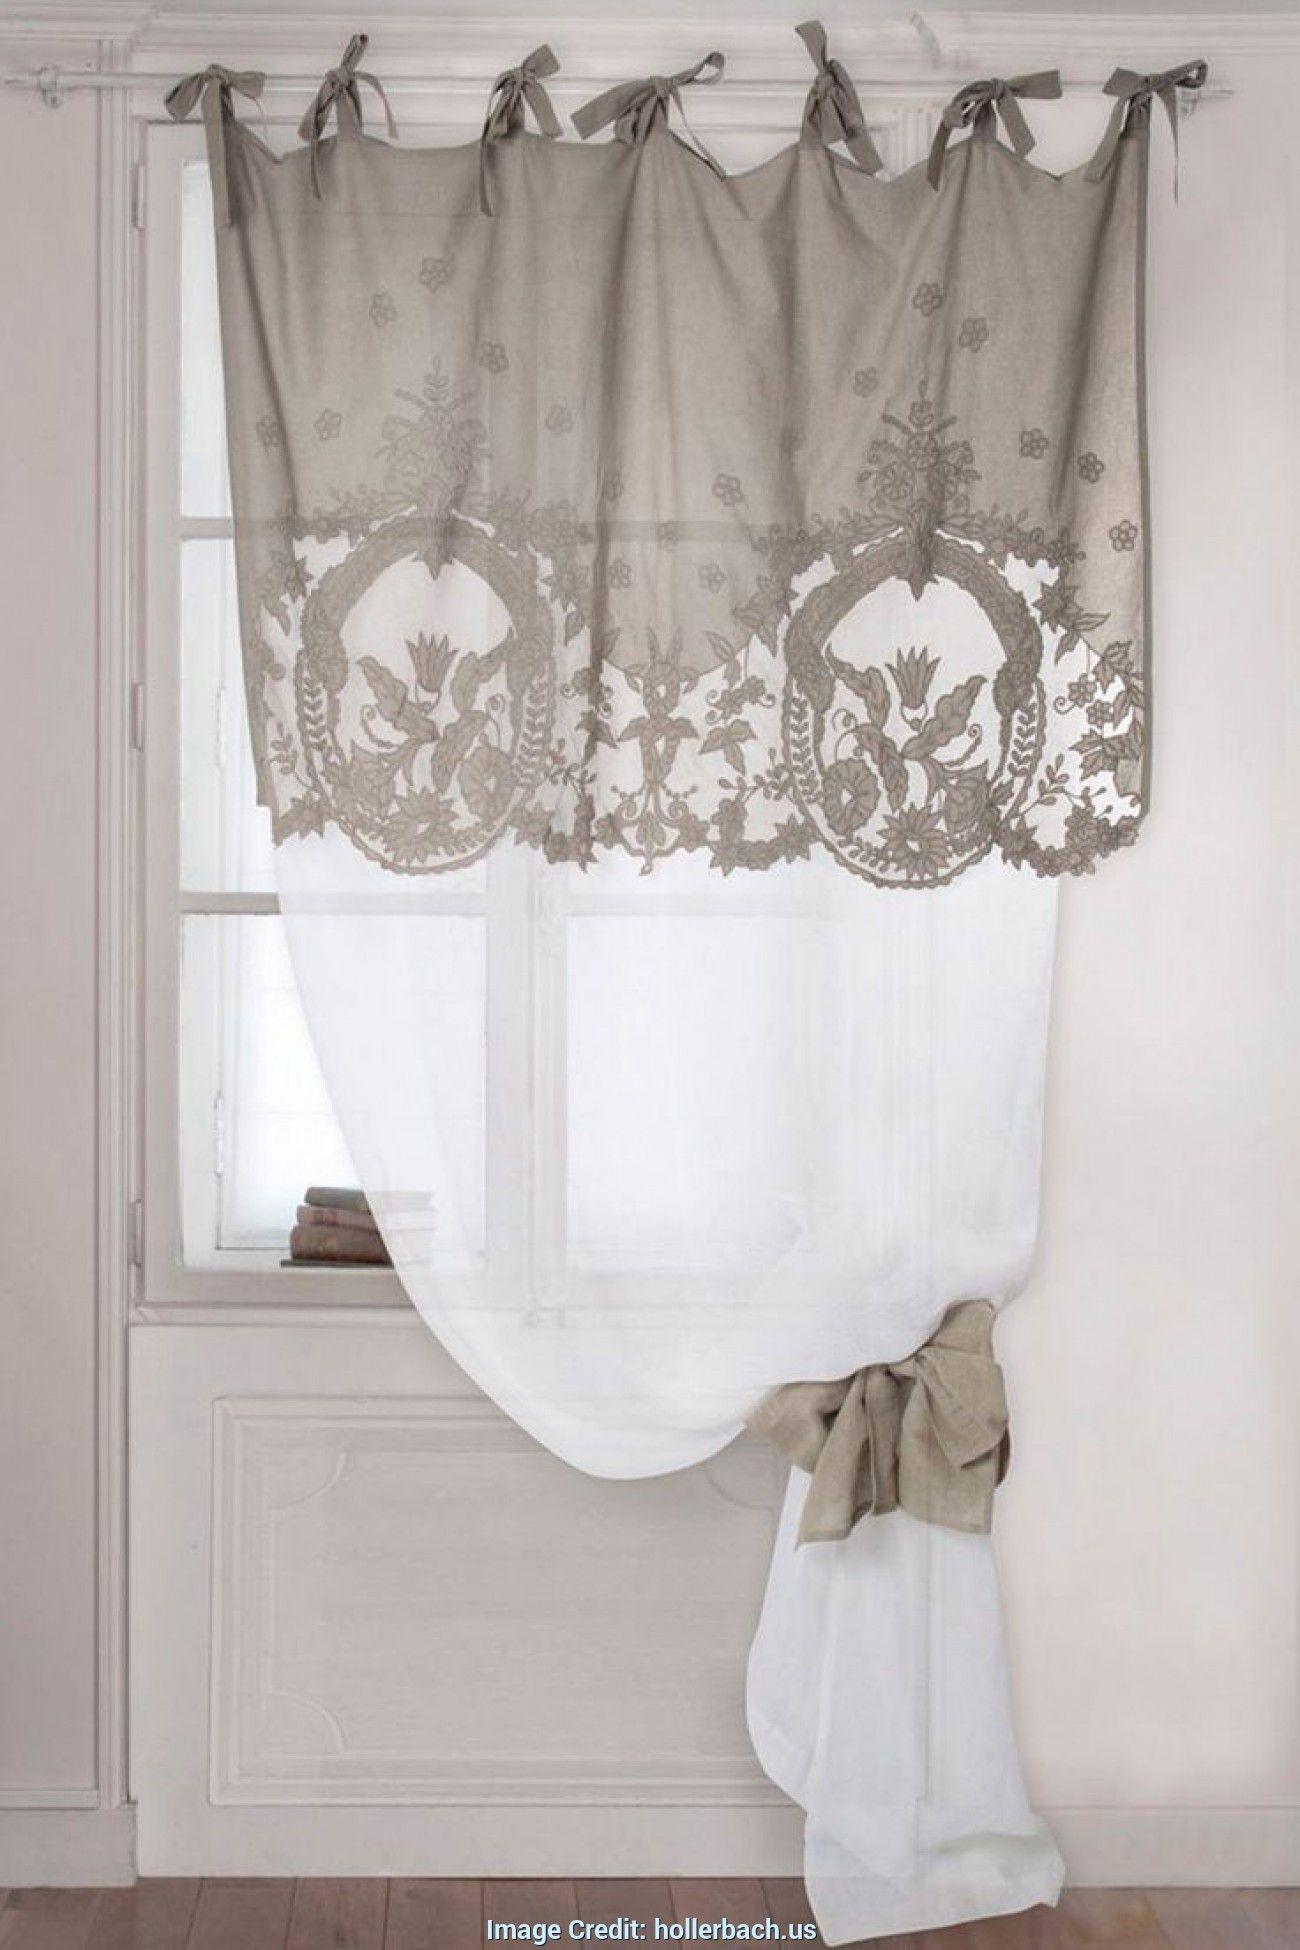 Arredare la camera da letto secondo questa tendenza. Benefico Tende Ikea Soggiorno Banyo Pencereleri Keten Perde Daire Ic Tasarim